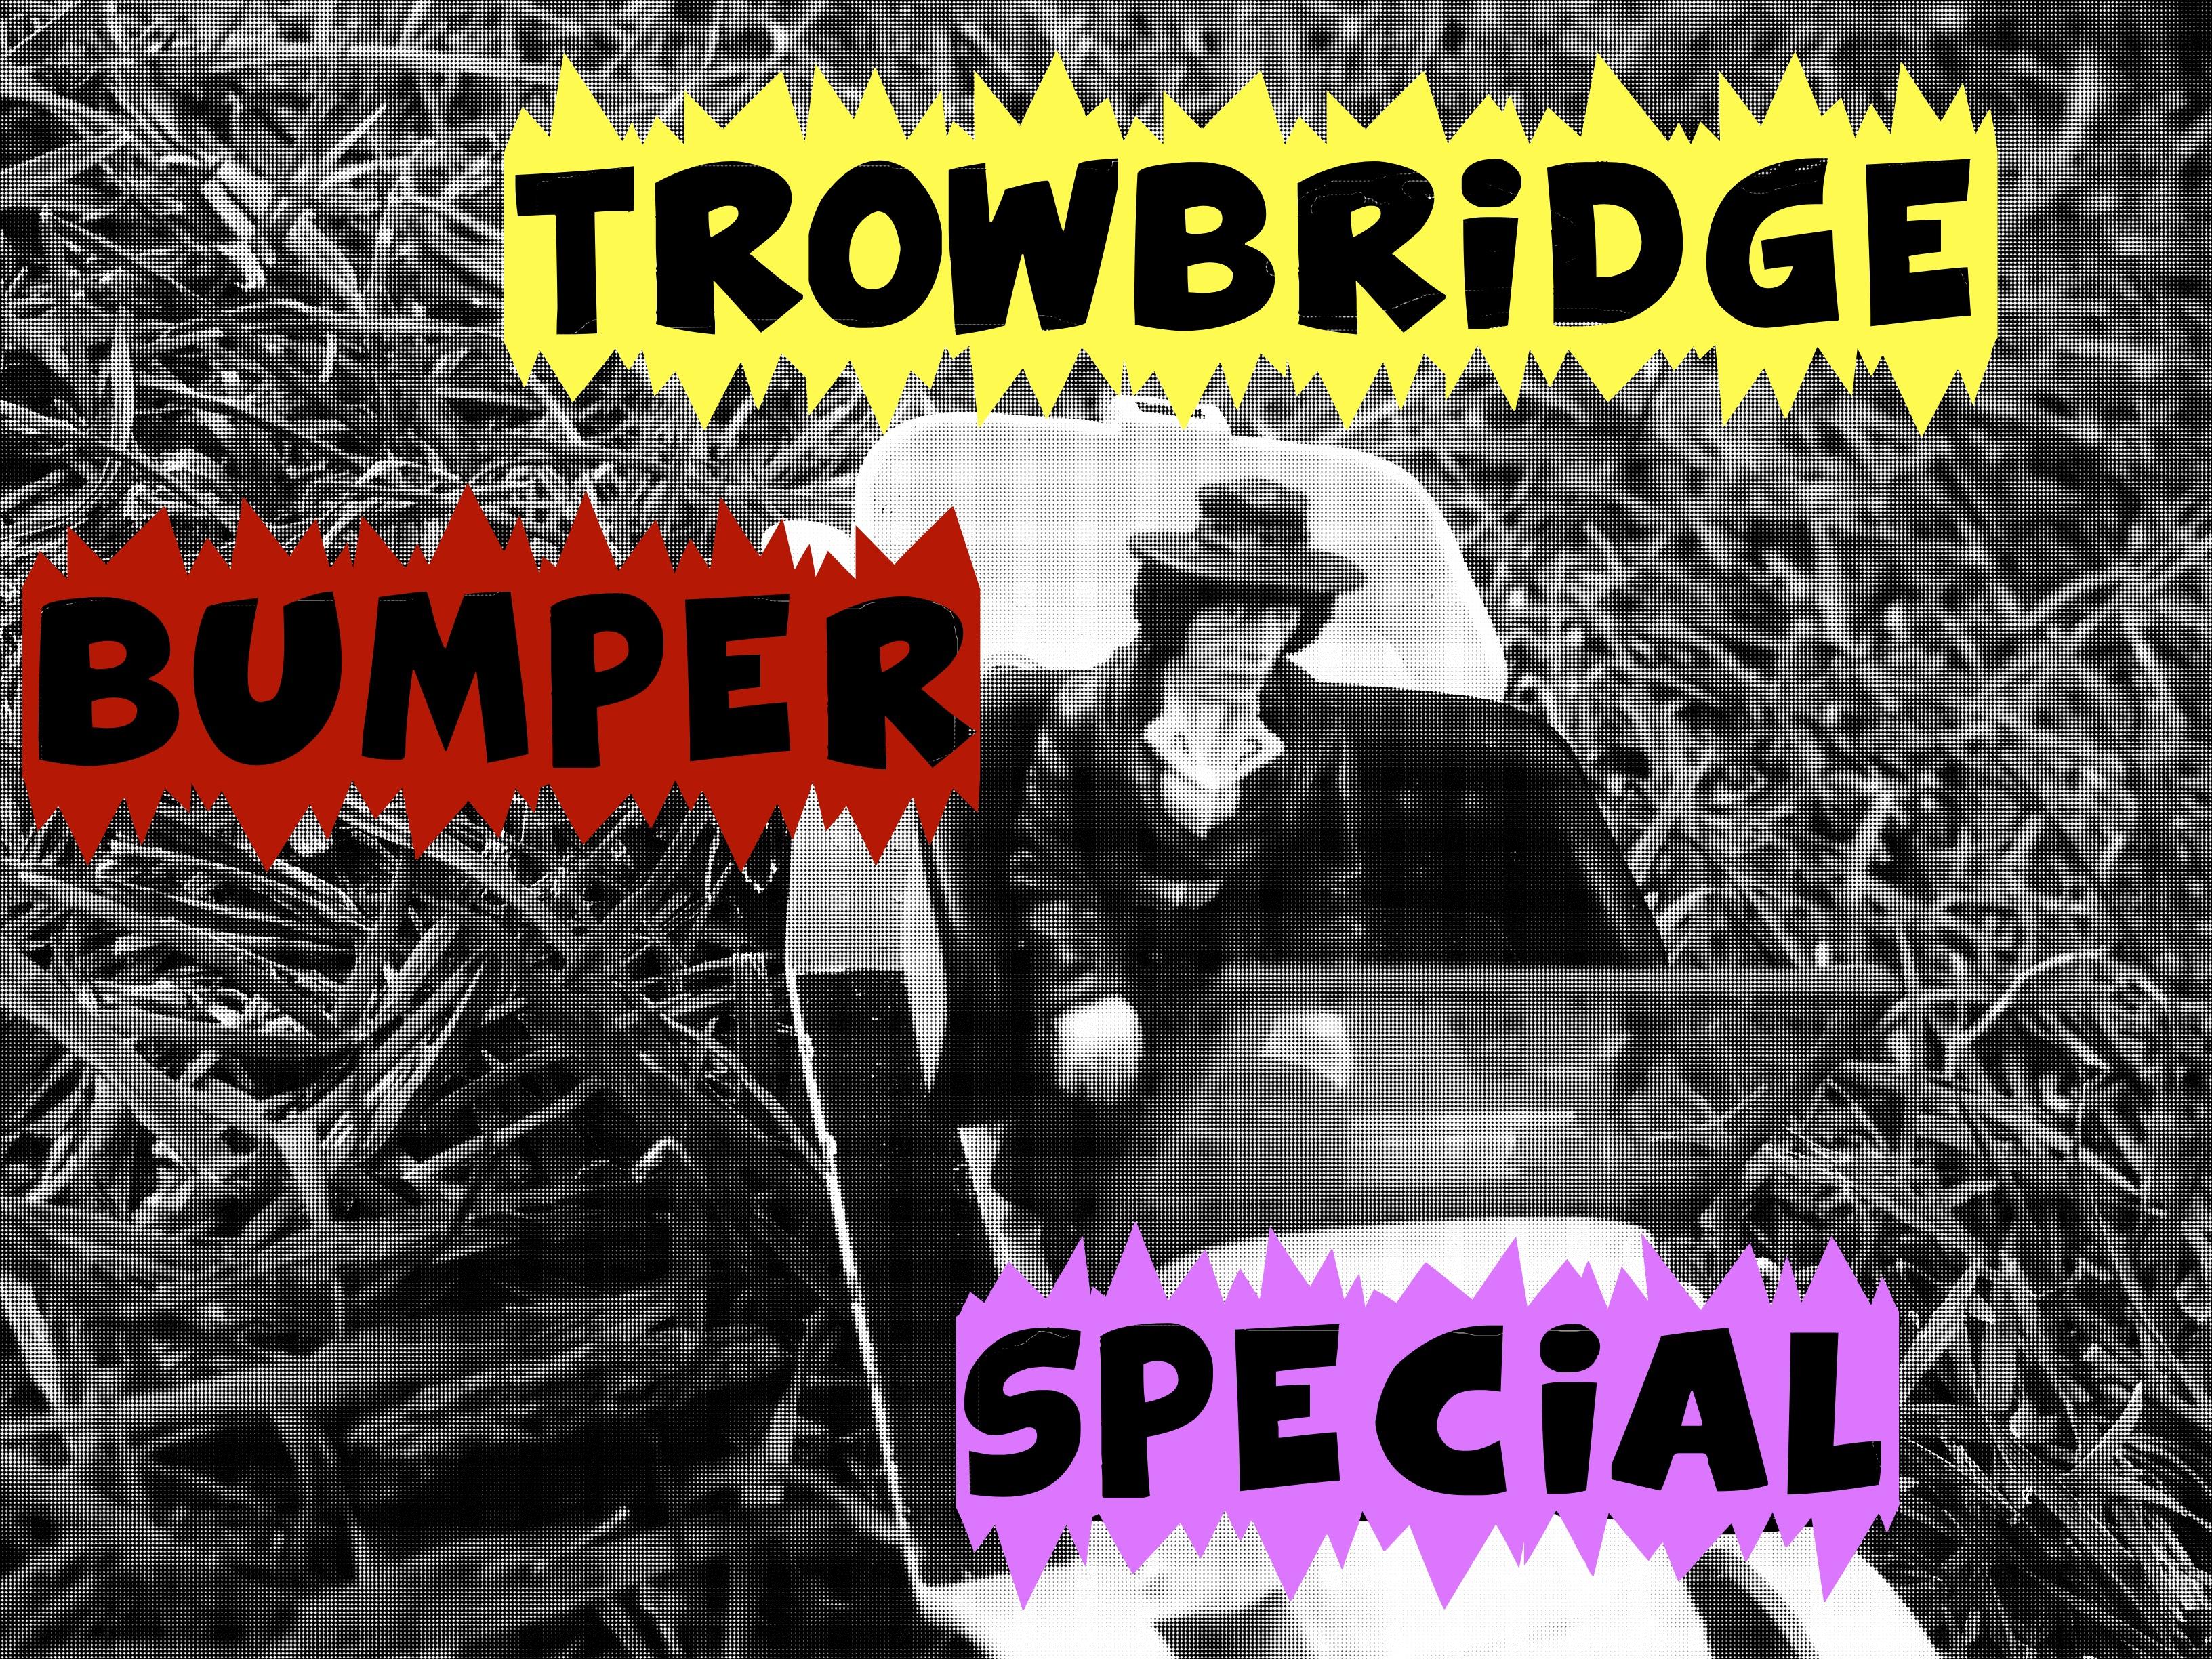 Bumper Trowbridge Special